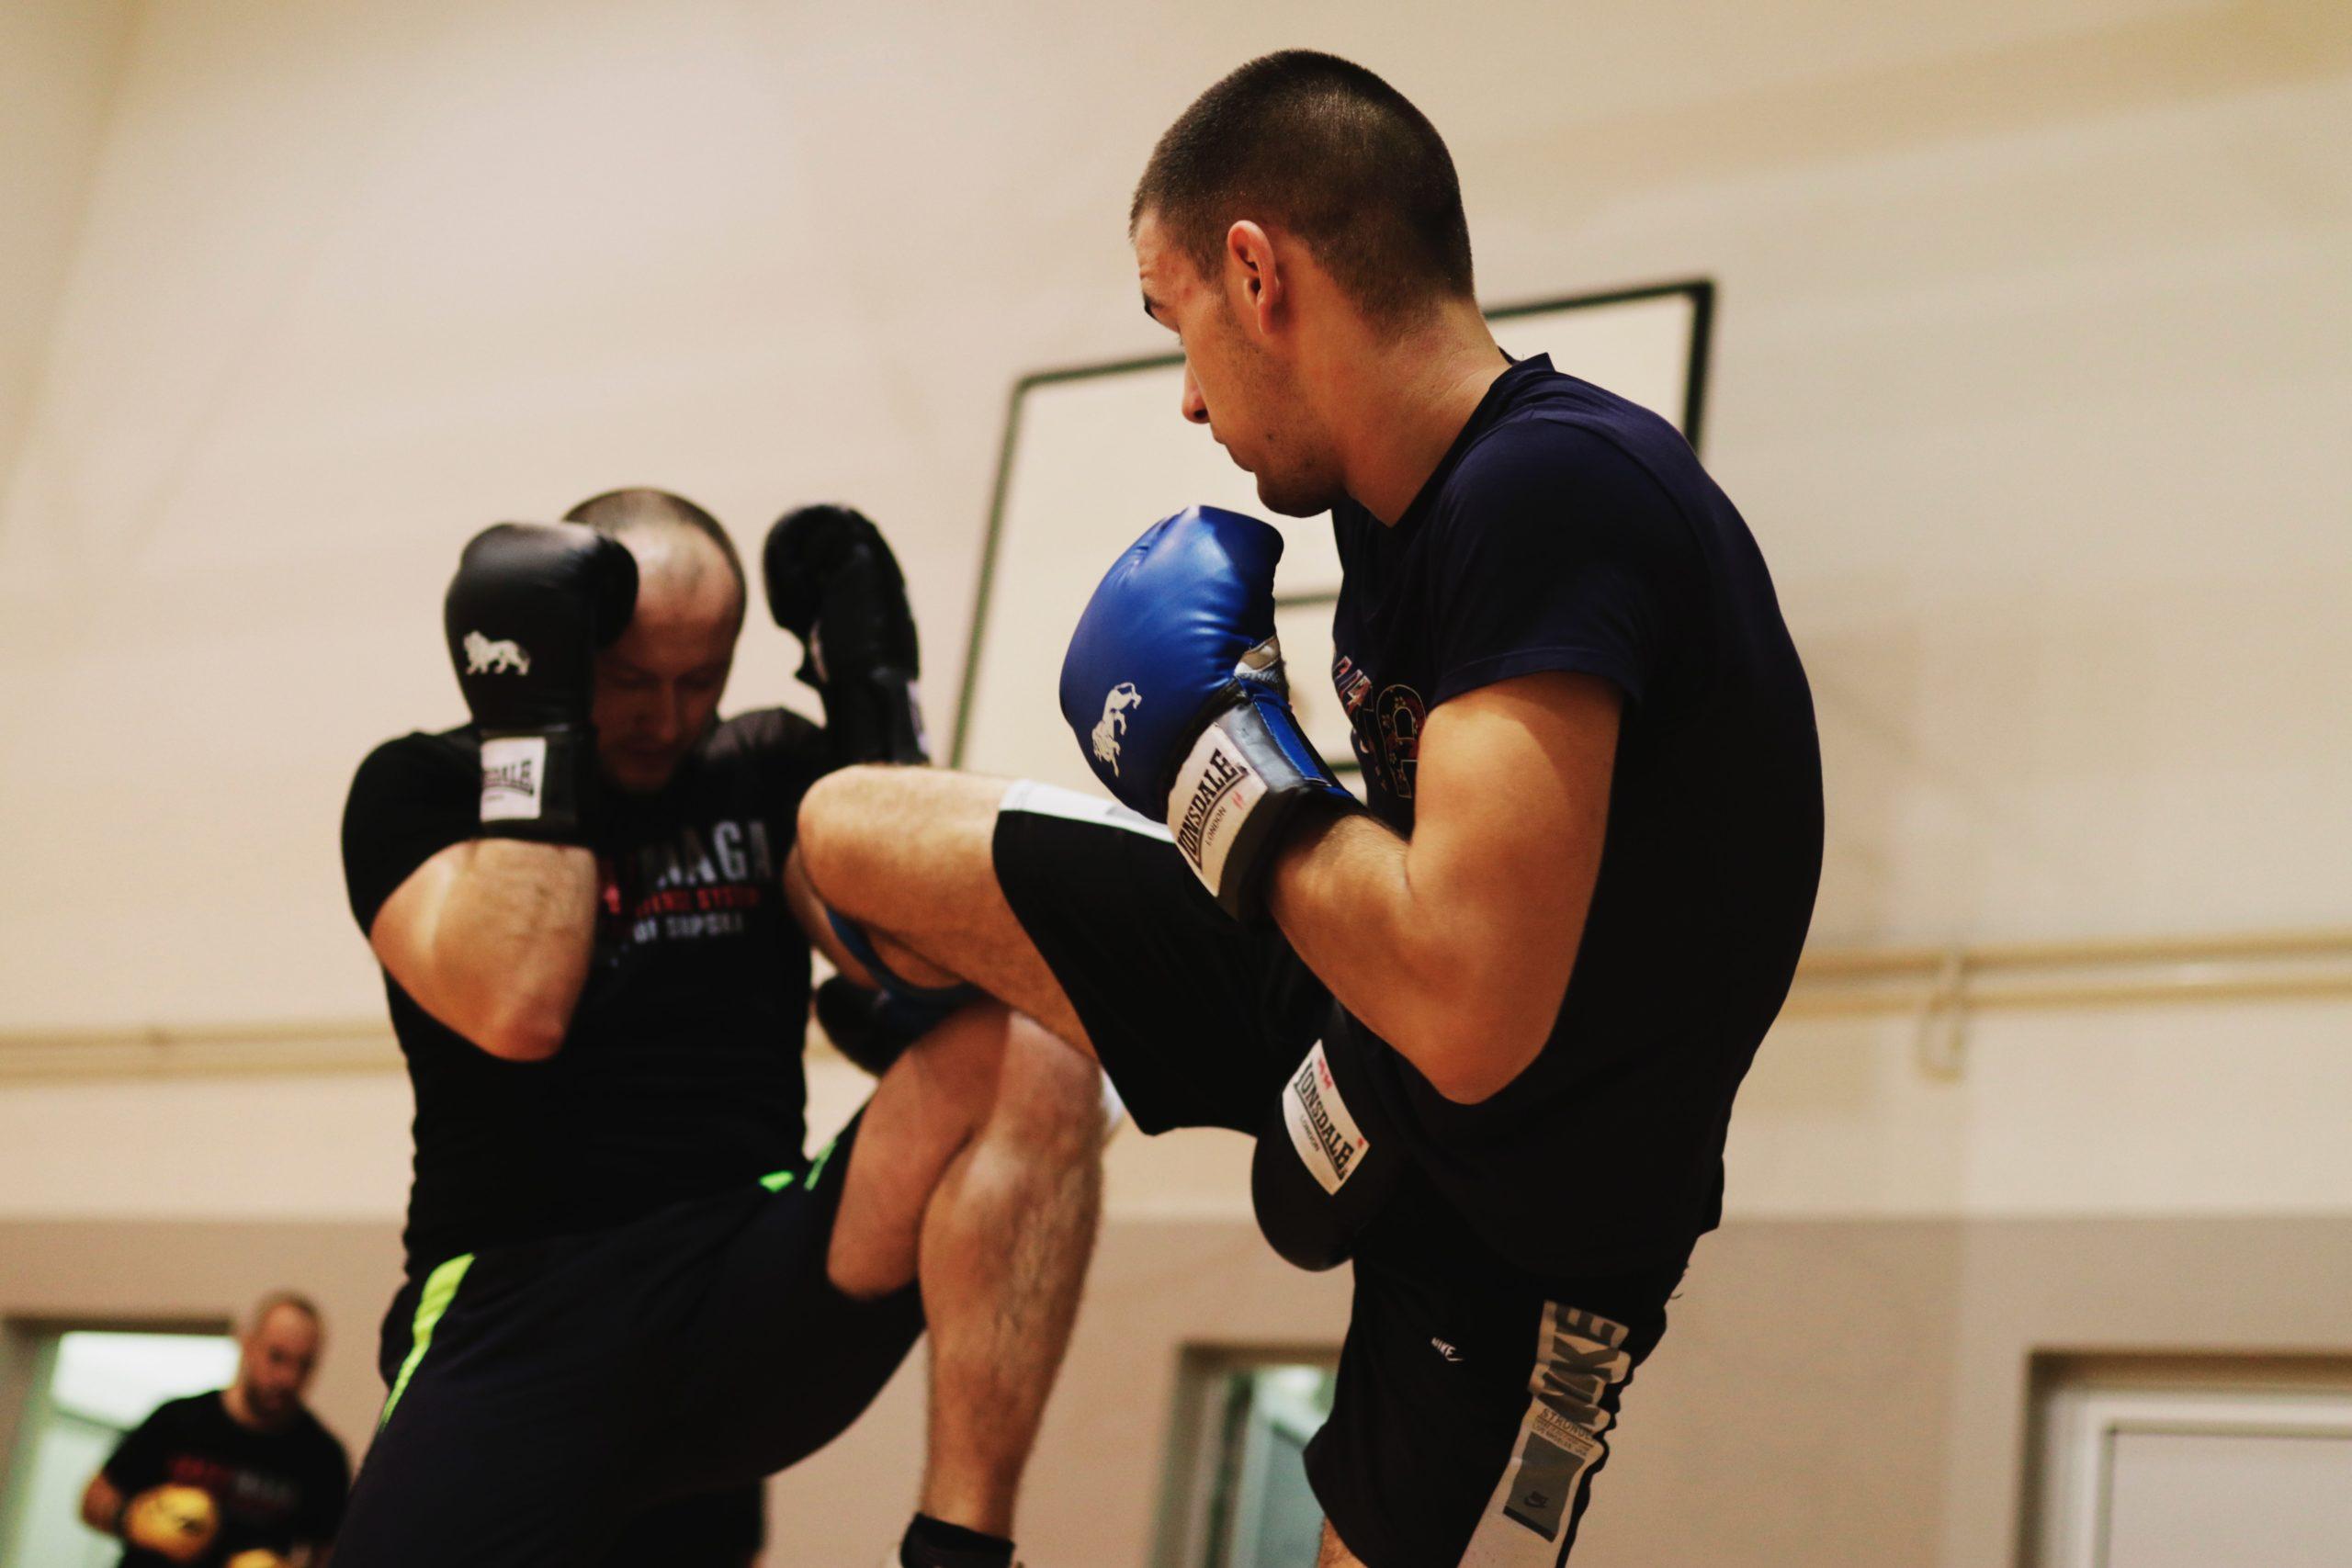 muay-thai-vs-kickboxing